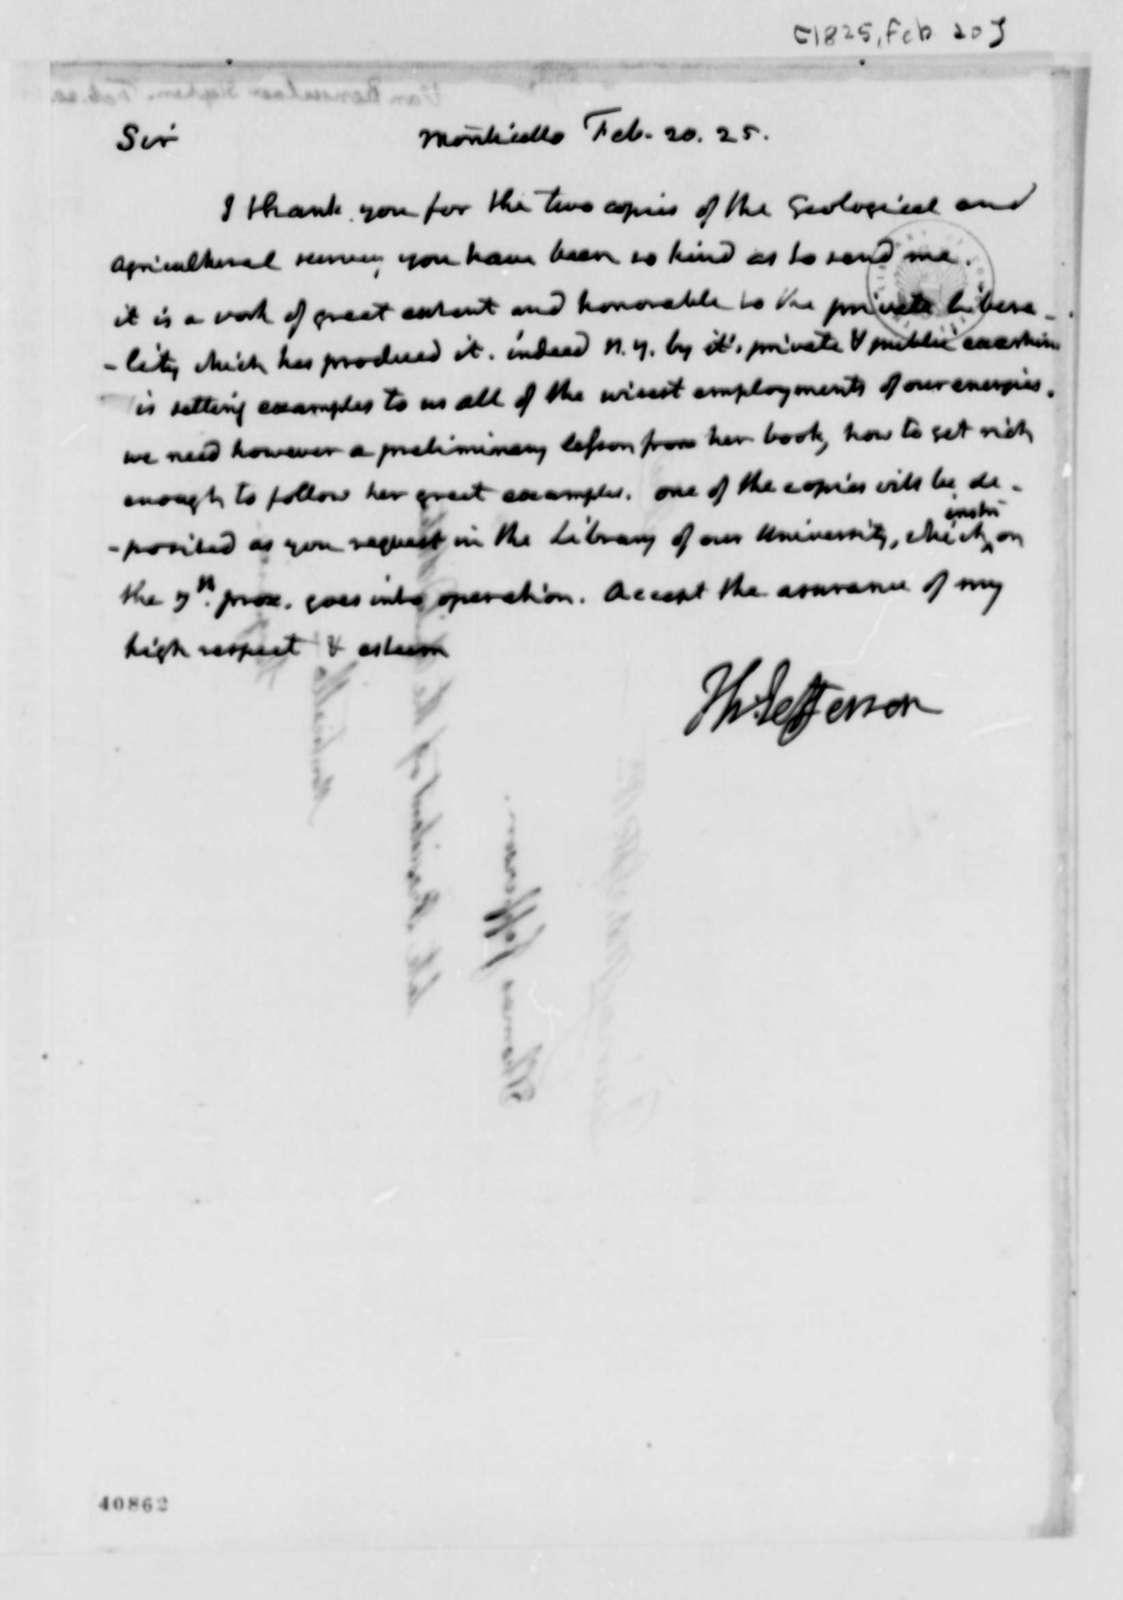 Thomas Jefferson to Stephen van Rensselaer, February 20, 1825